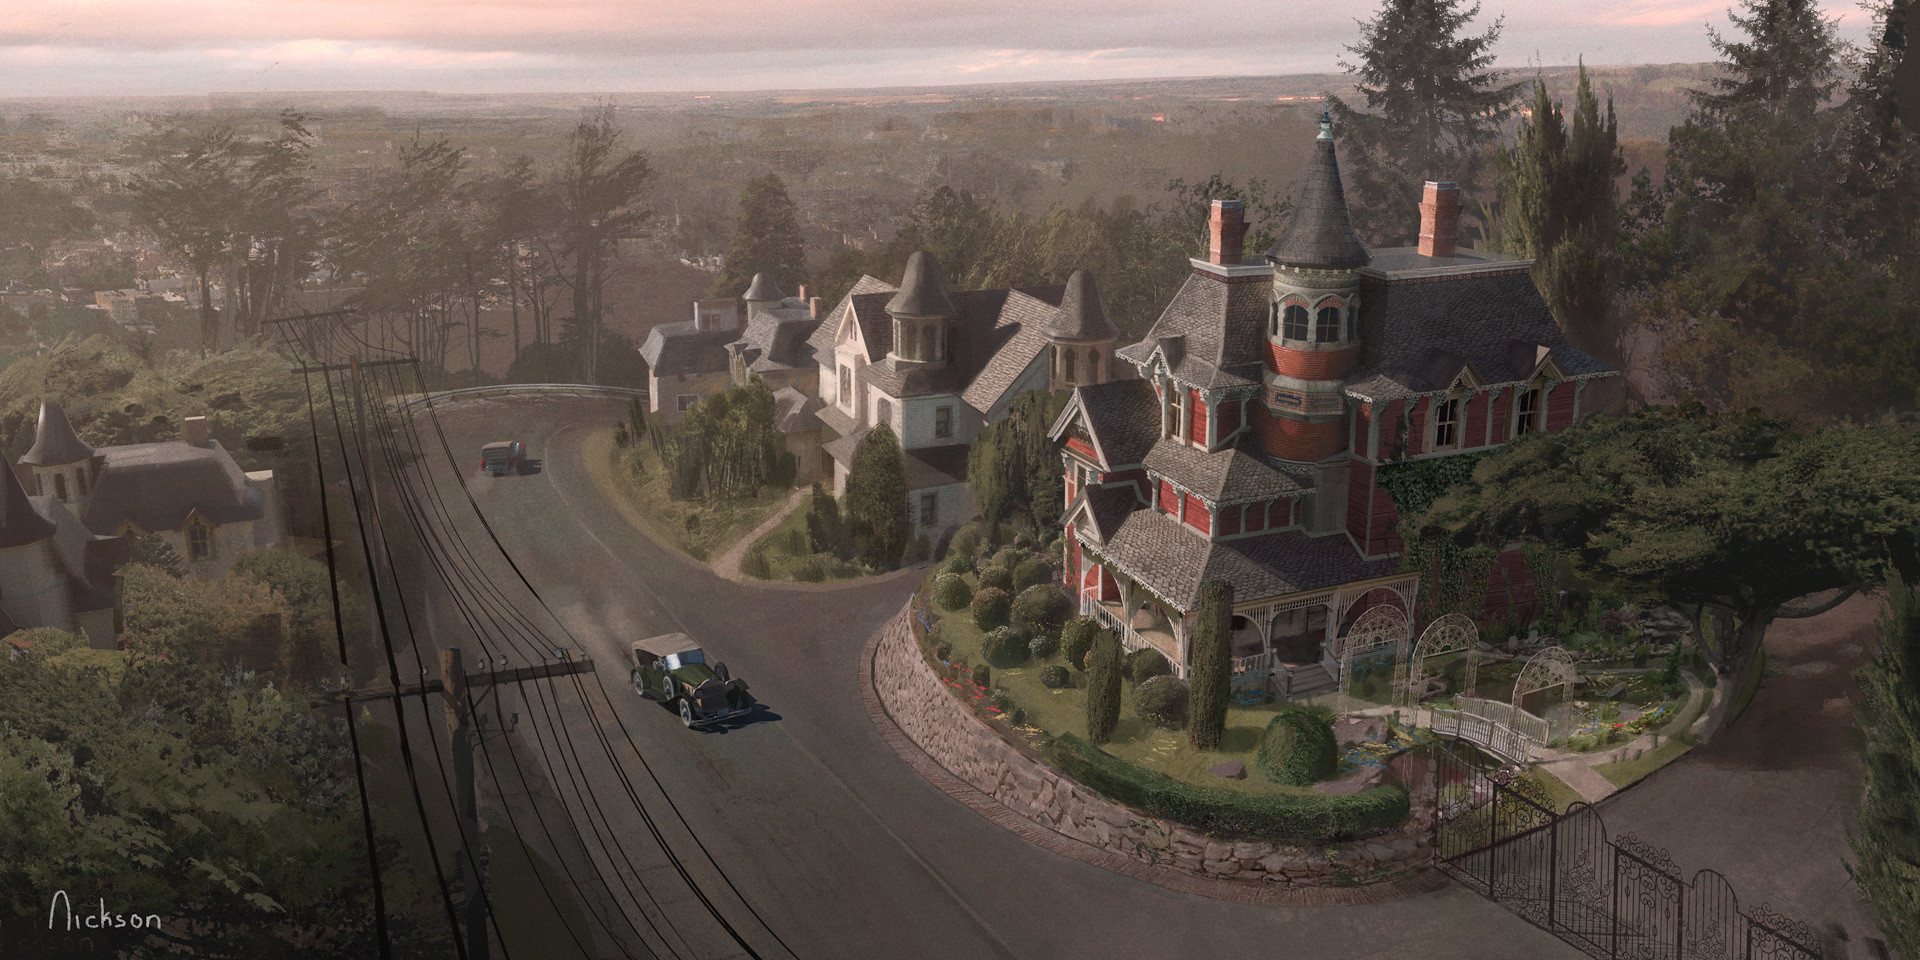 Joseph nickson gothic road